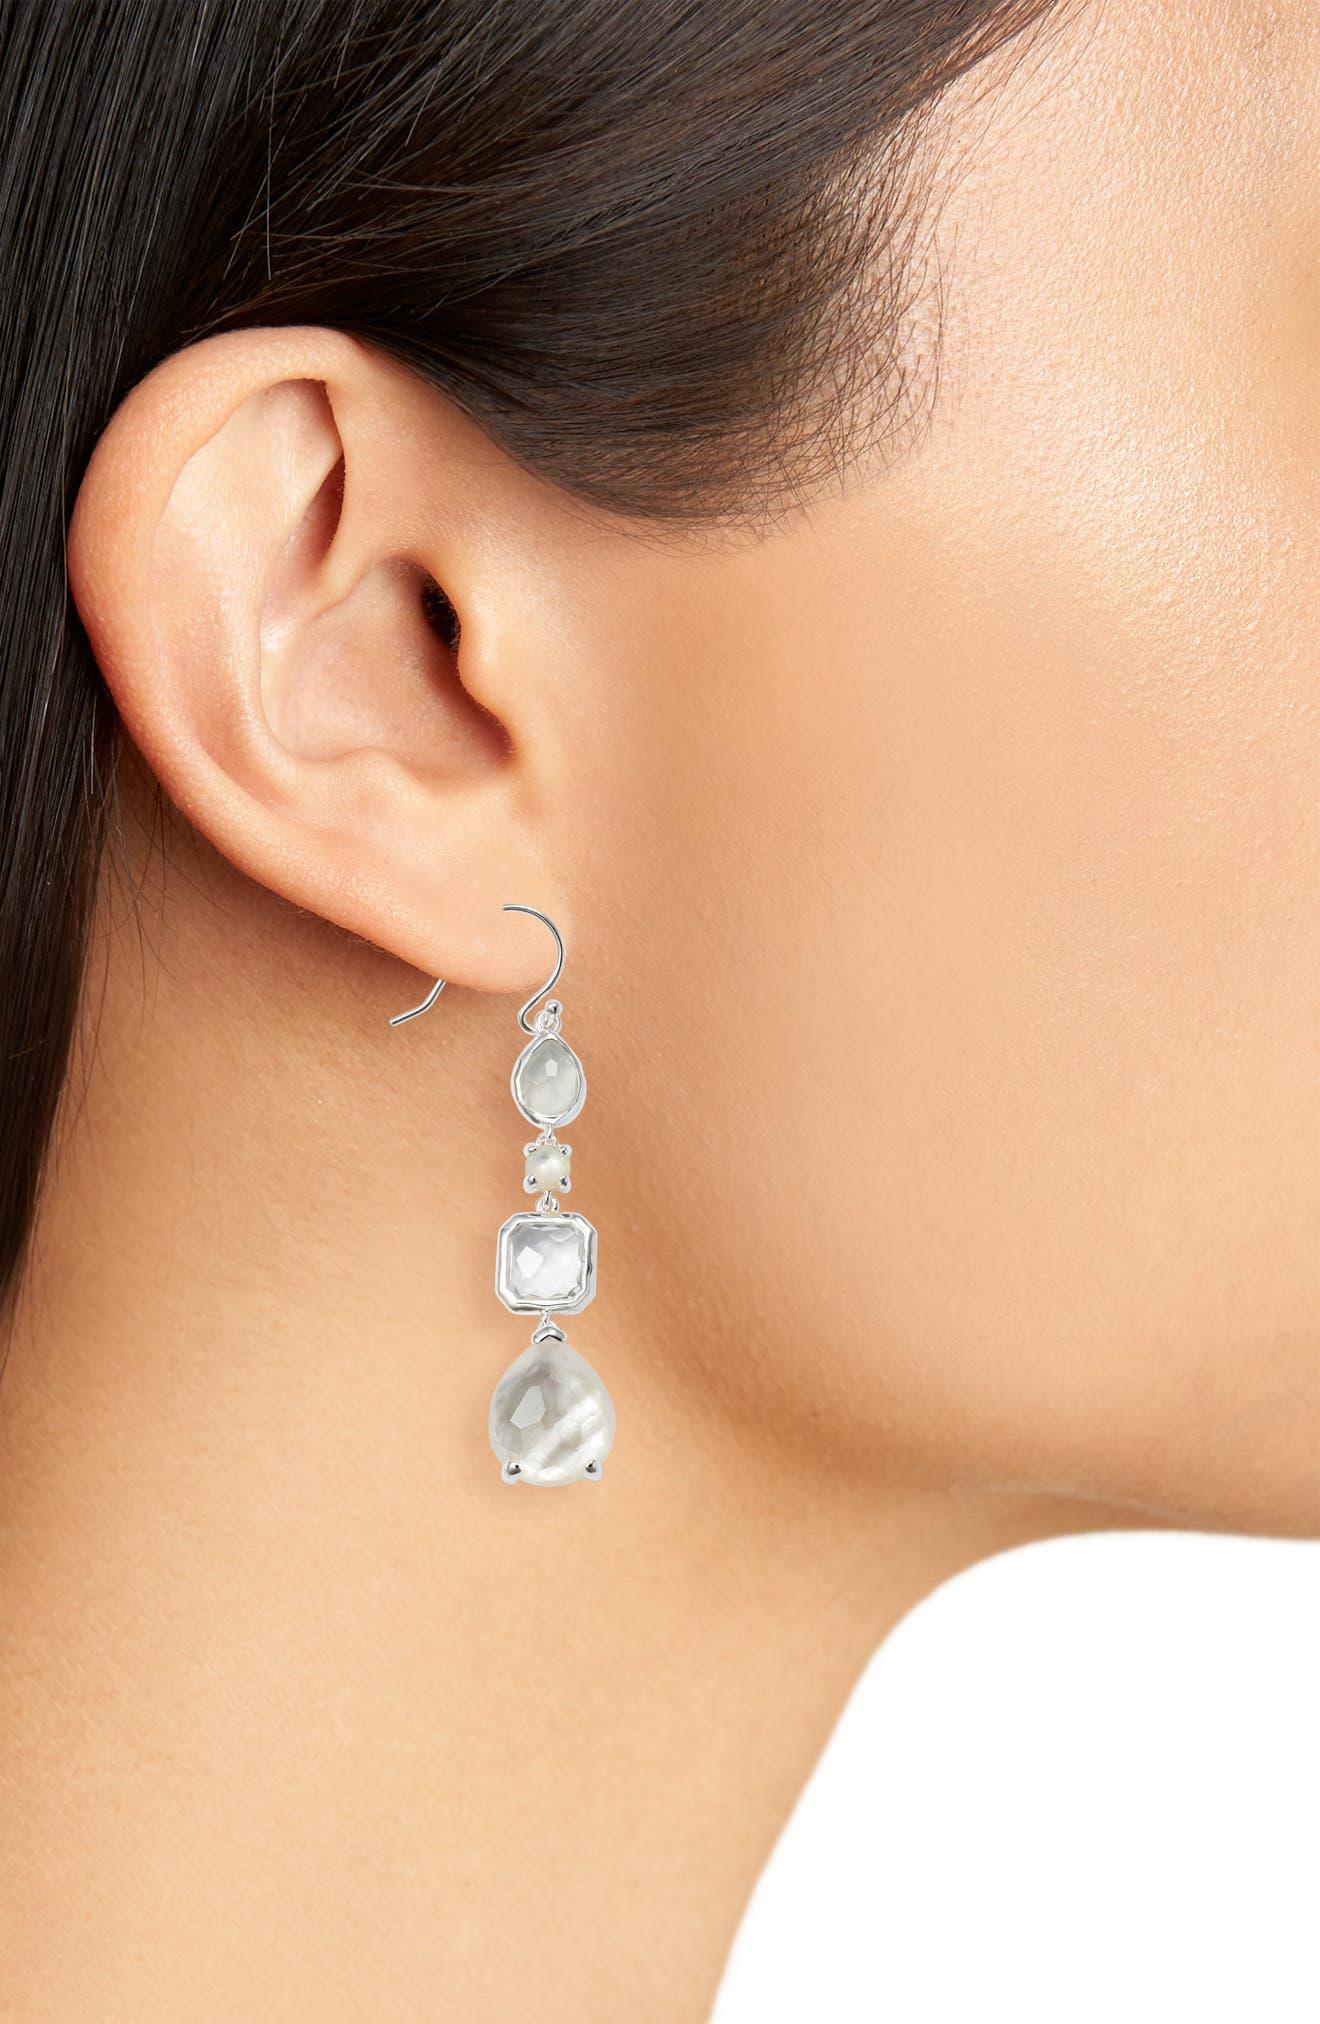 'Rock Candy' Semiprecious Stone Linear Drop Earrings,                             Alternate thumbnail 2, color,                             Silver/ Flirt